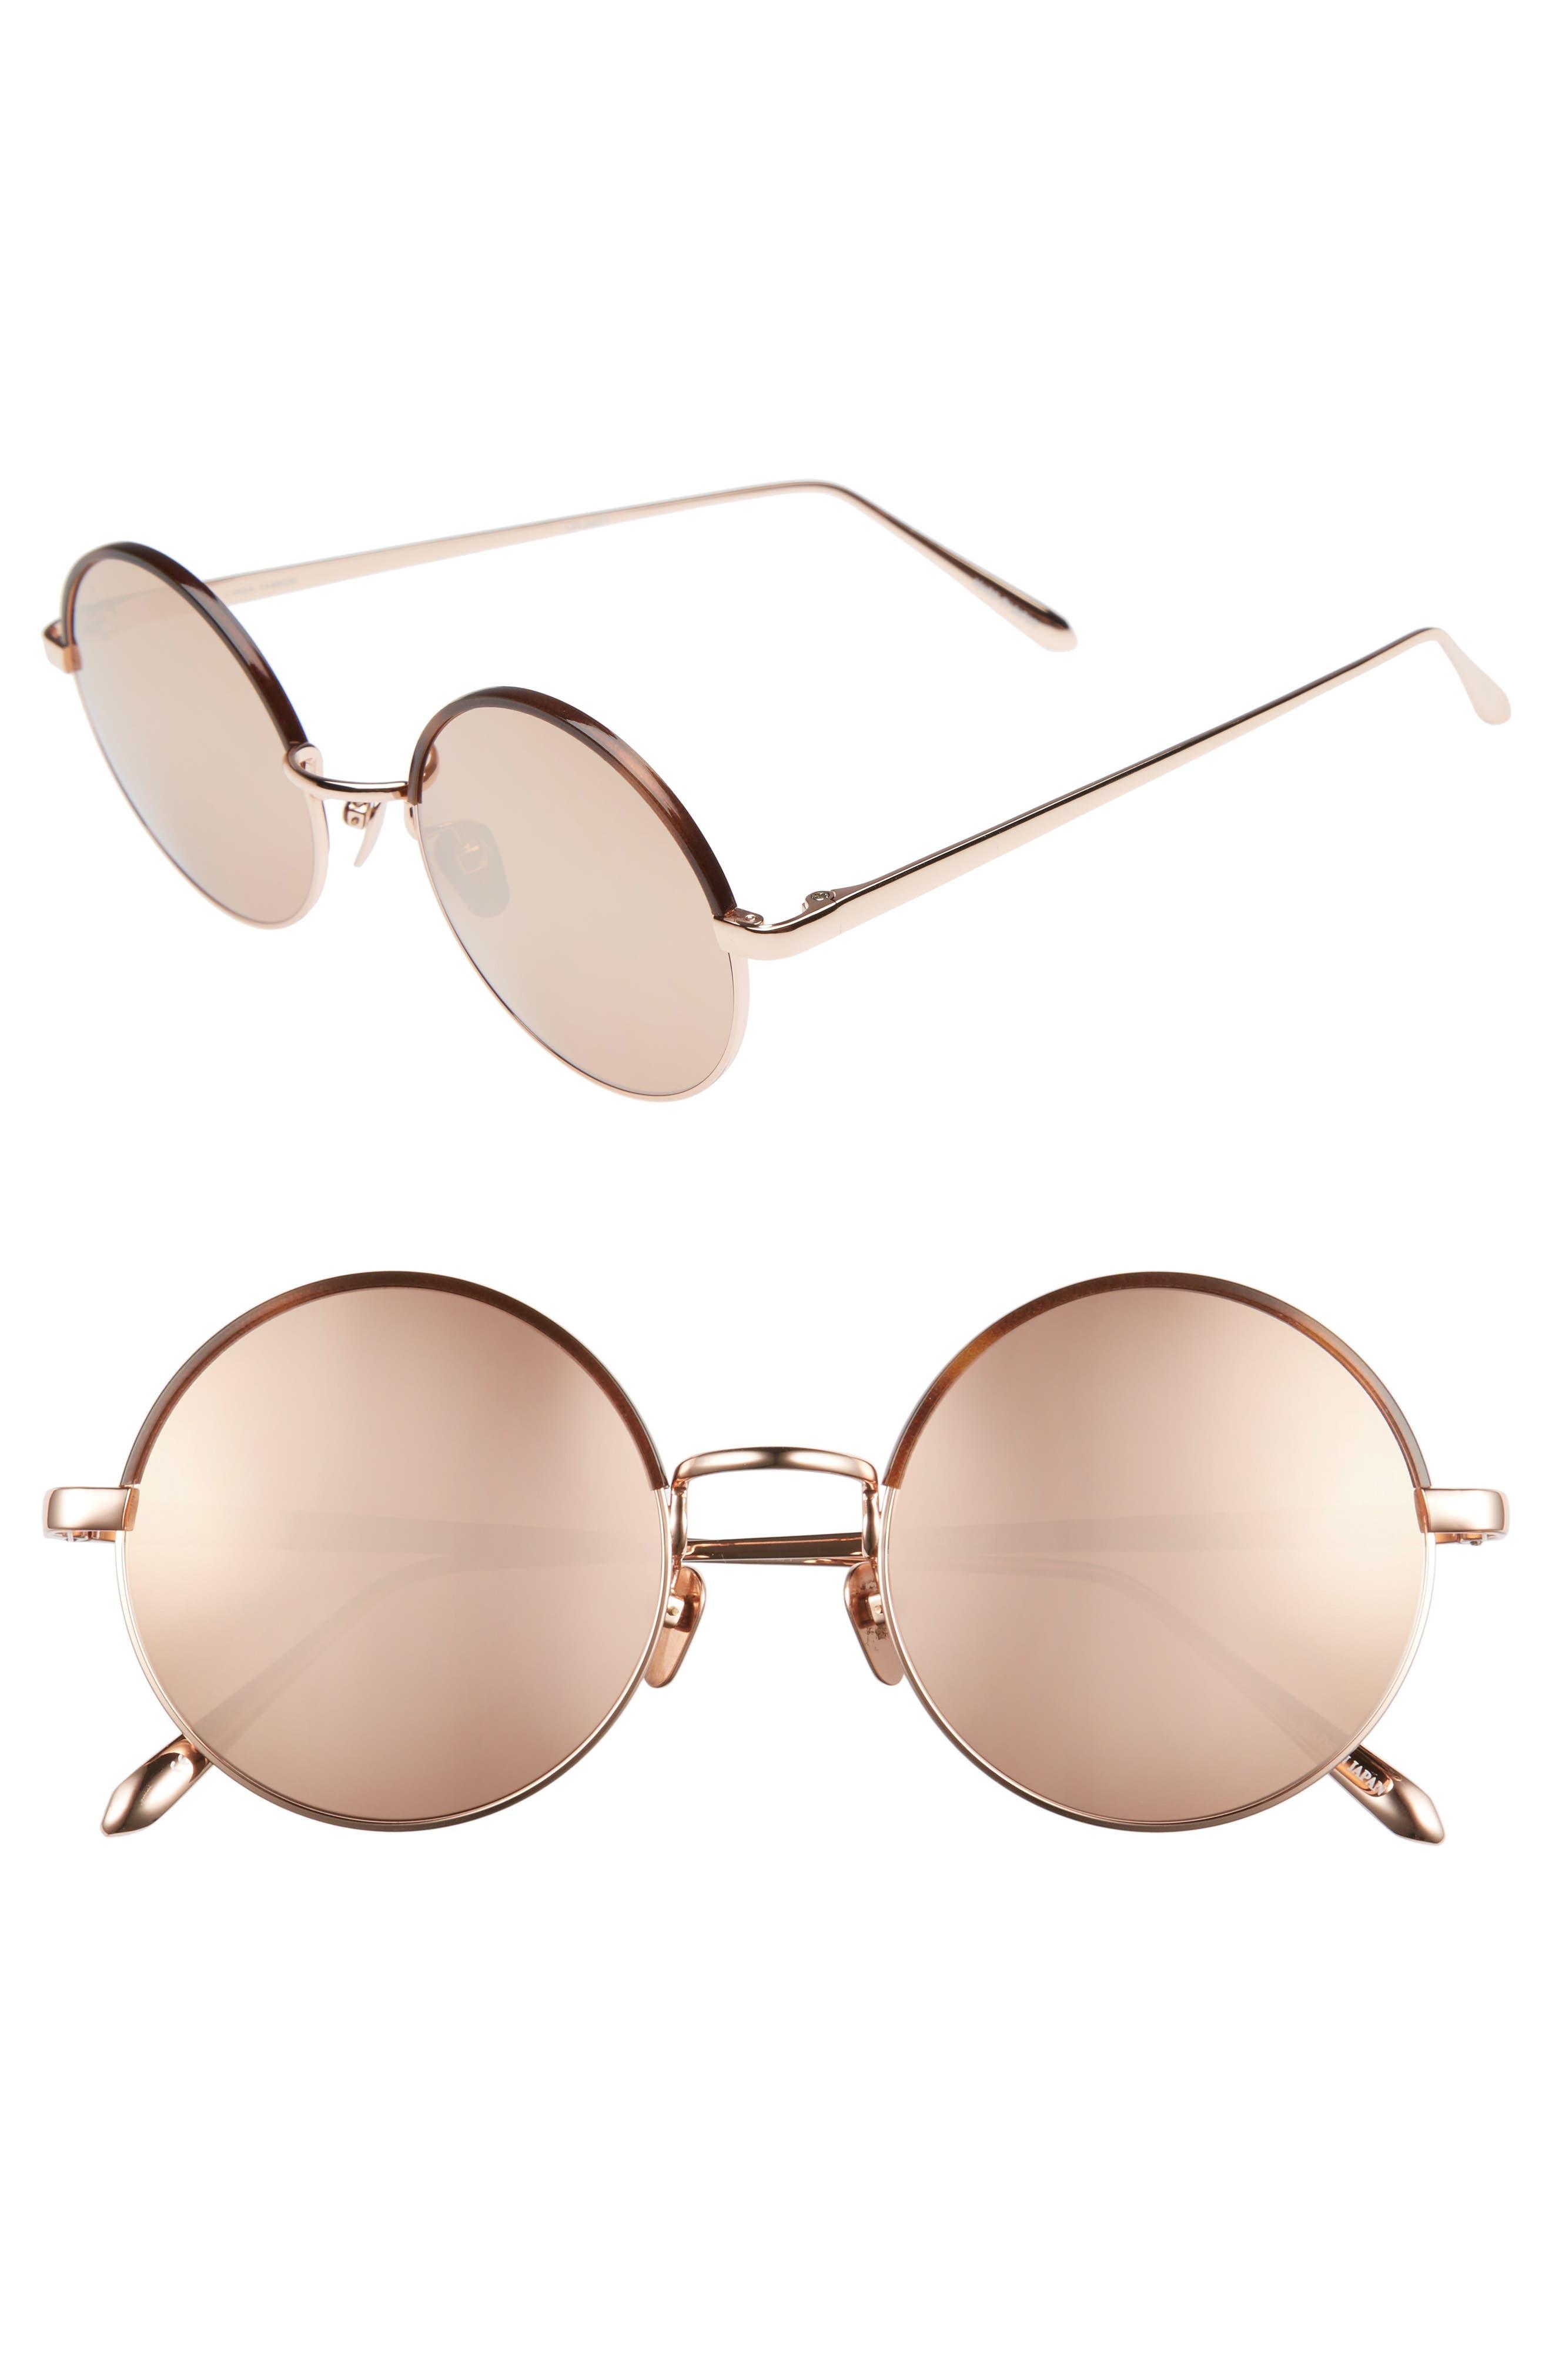 51mm Mirrored 18 Karat Gold Trim Round Sunglasses,                         Main,                         color, Rose Gold/ Mocha/ Rose Gold